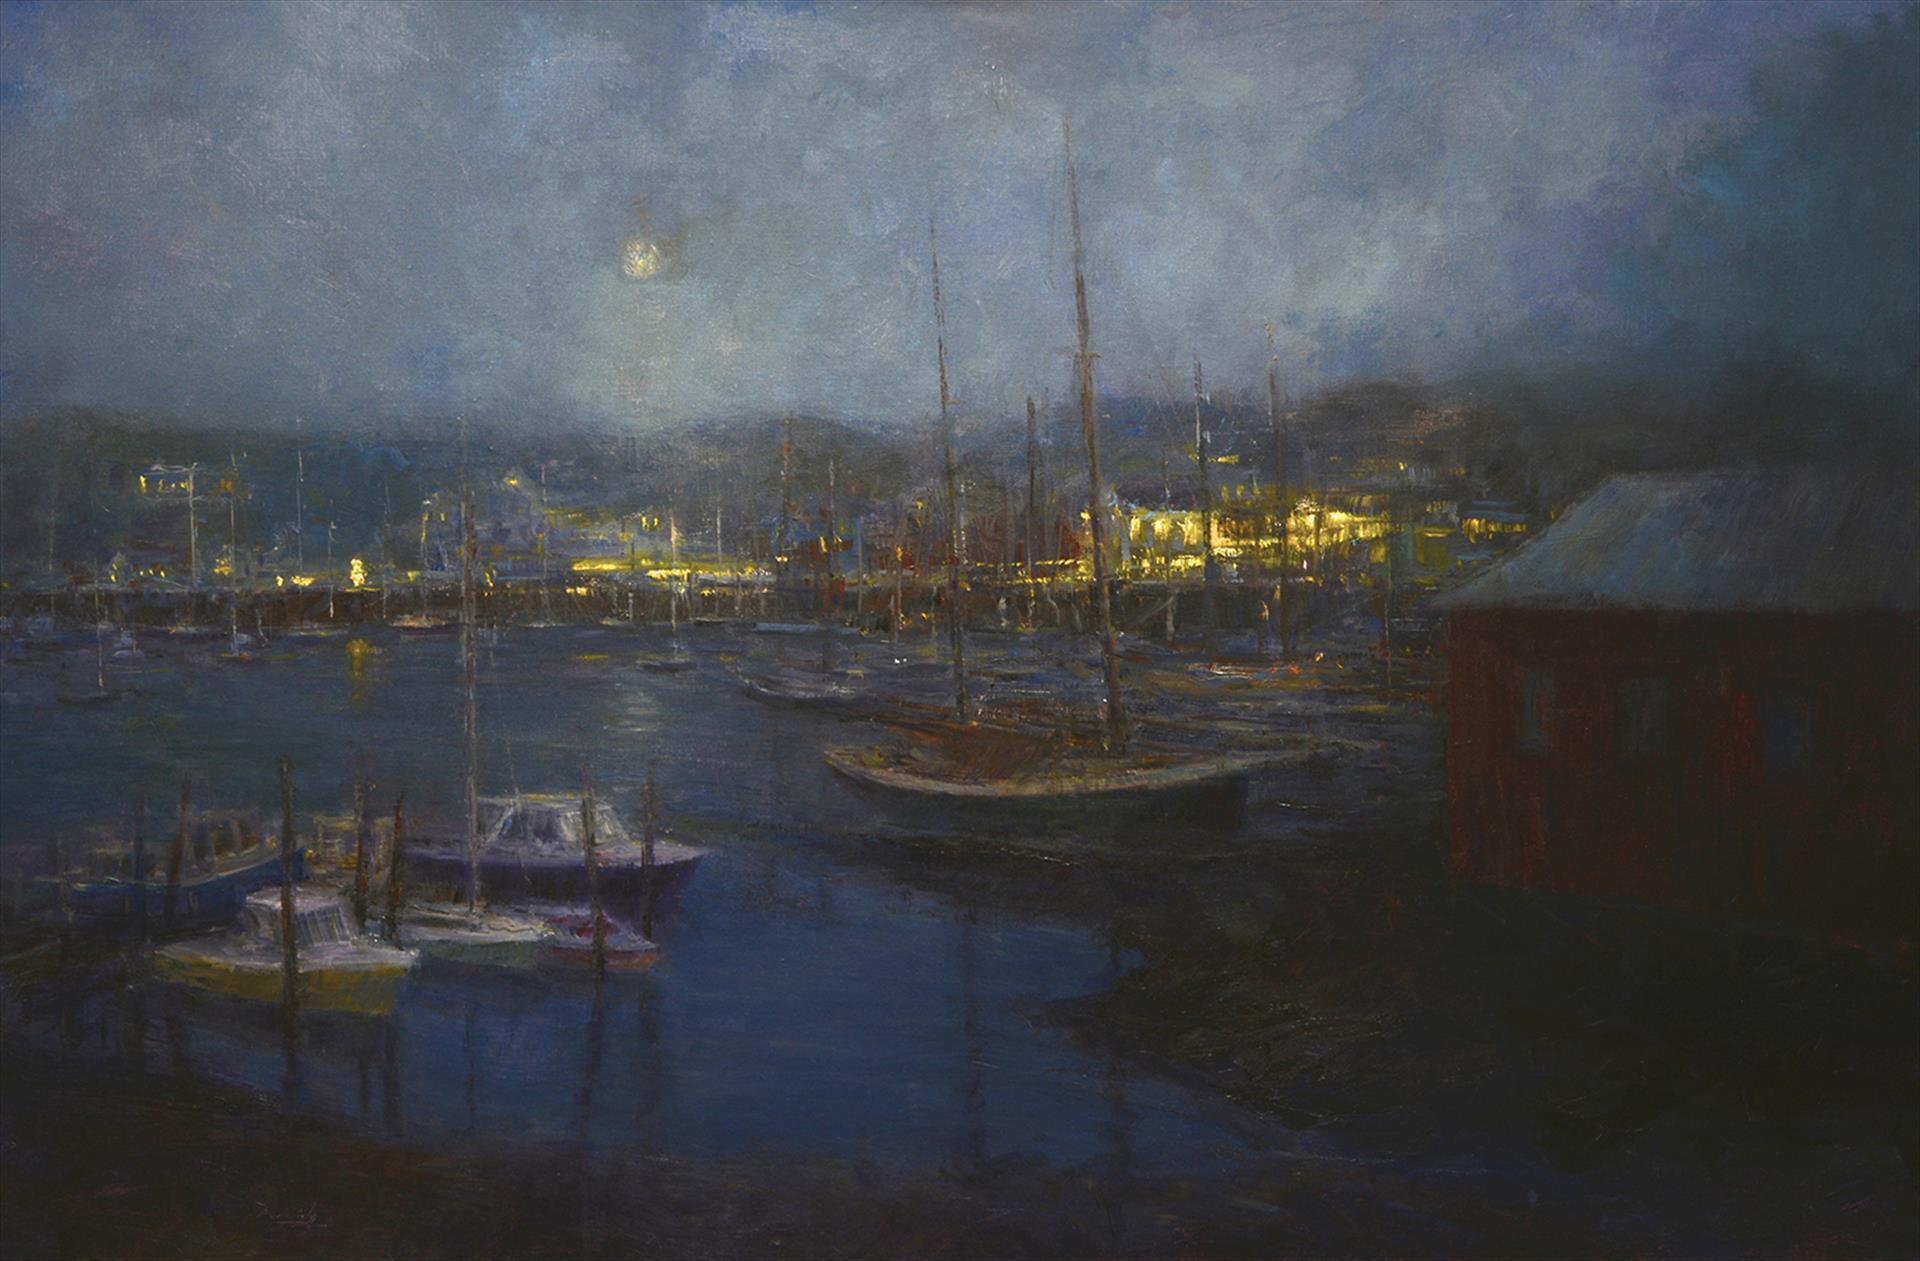 Harbor Lights, Camden an oil by Mark Daly won PleinAir Salon's Best Nocturne Award